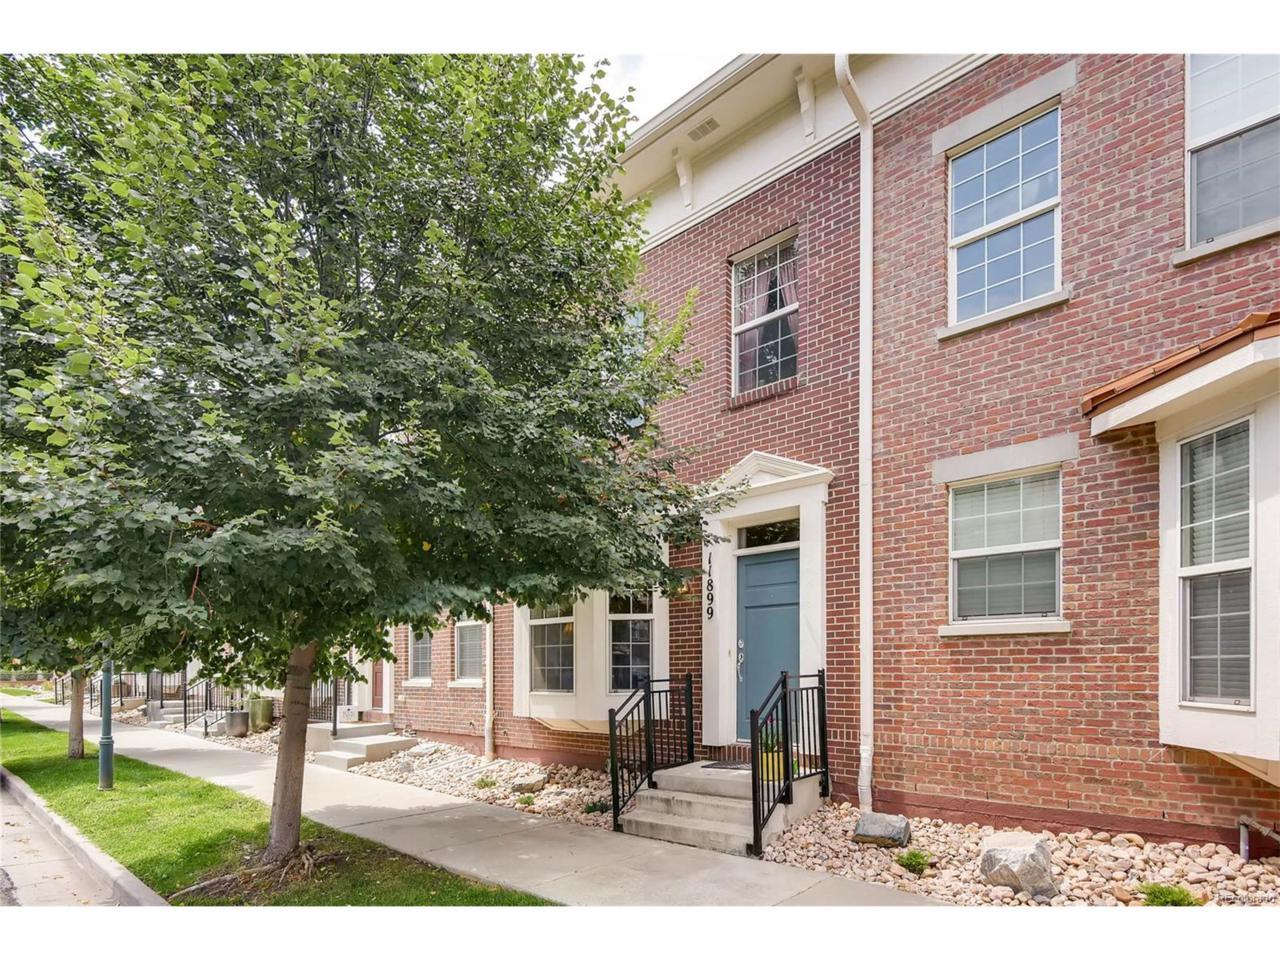 11899 Quitman Street, Westminster, CO 80031 (MLS #4429699) :: 8z Real Estate